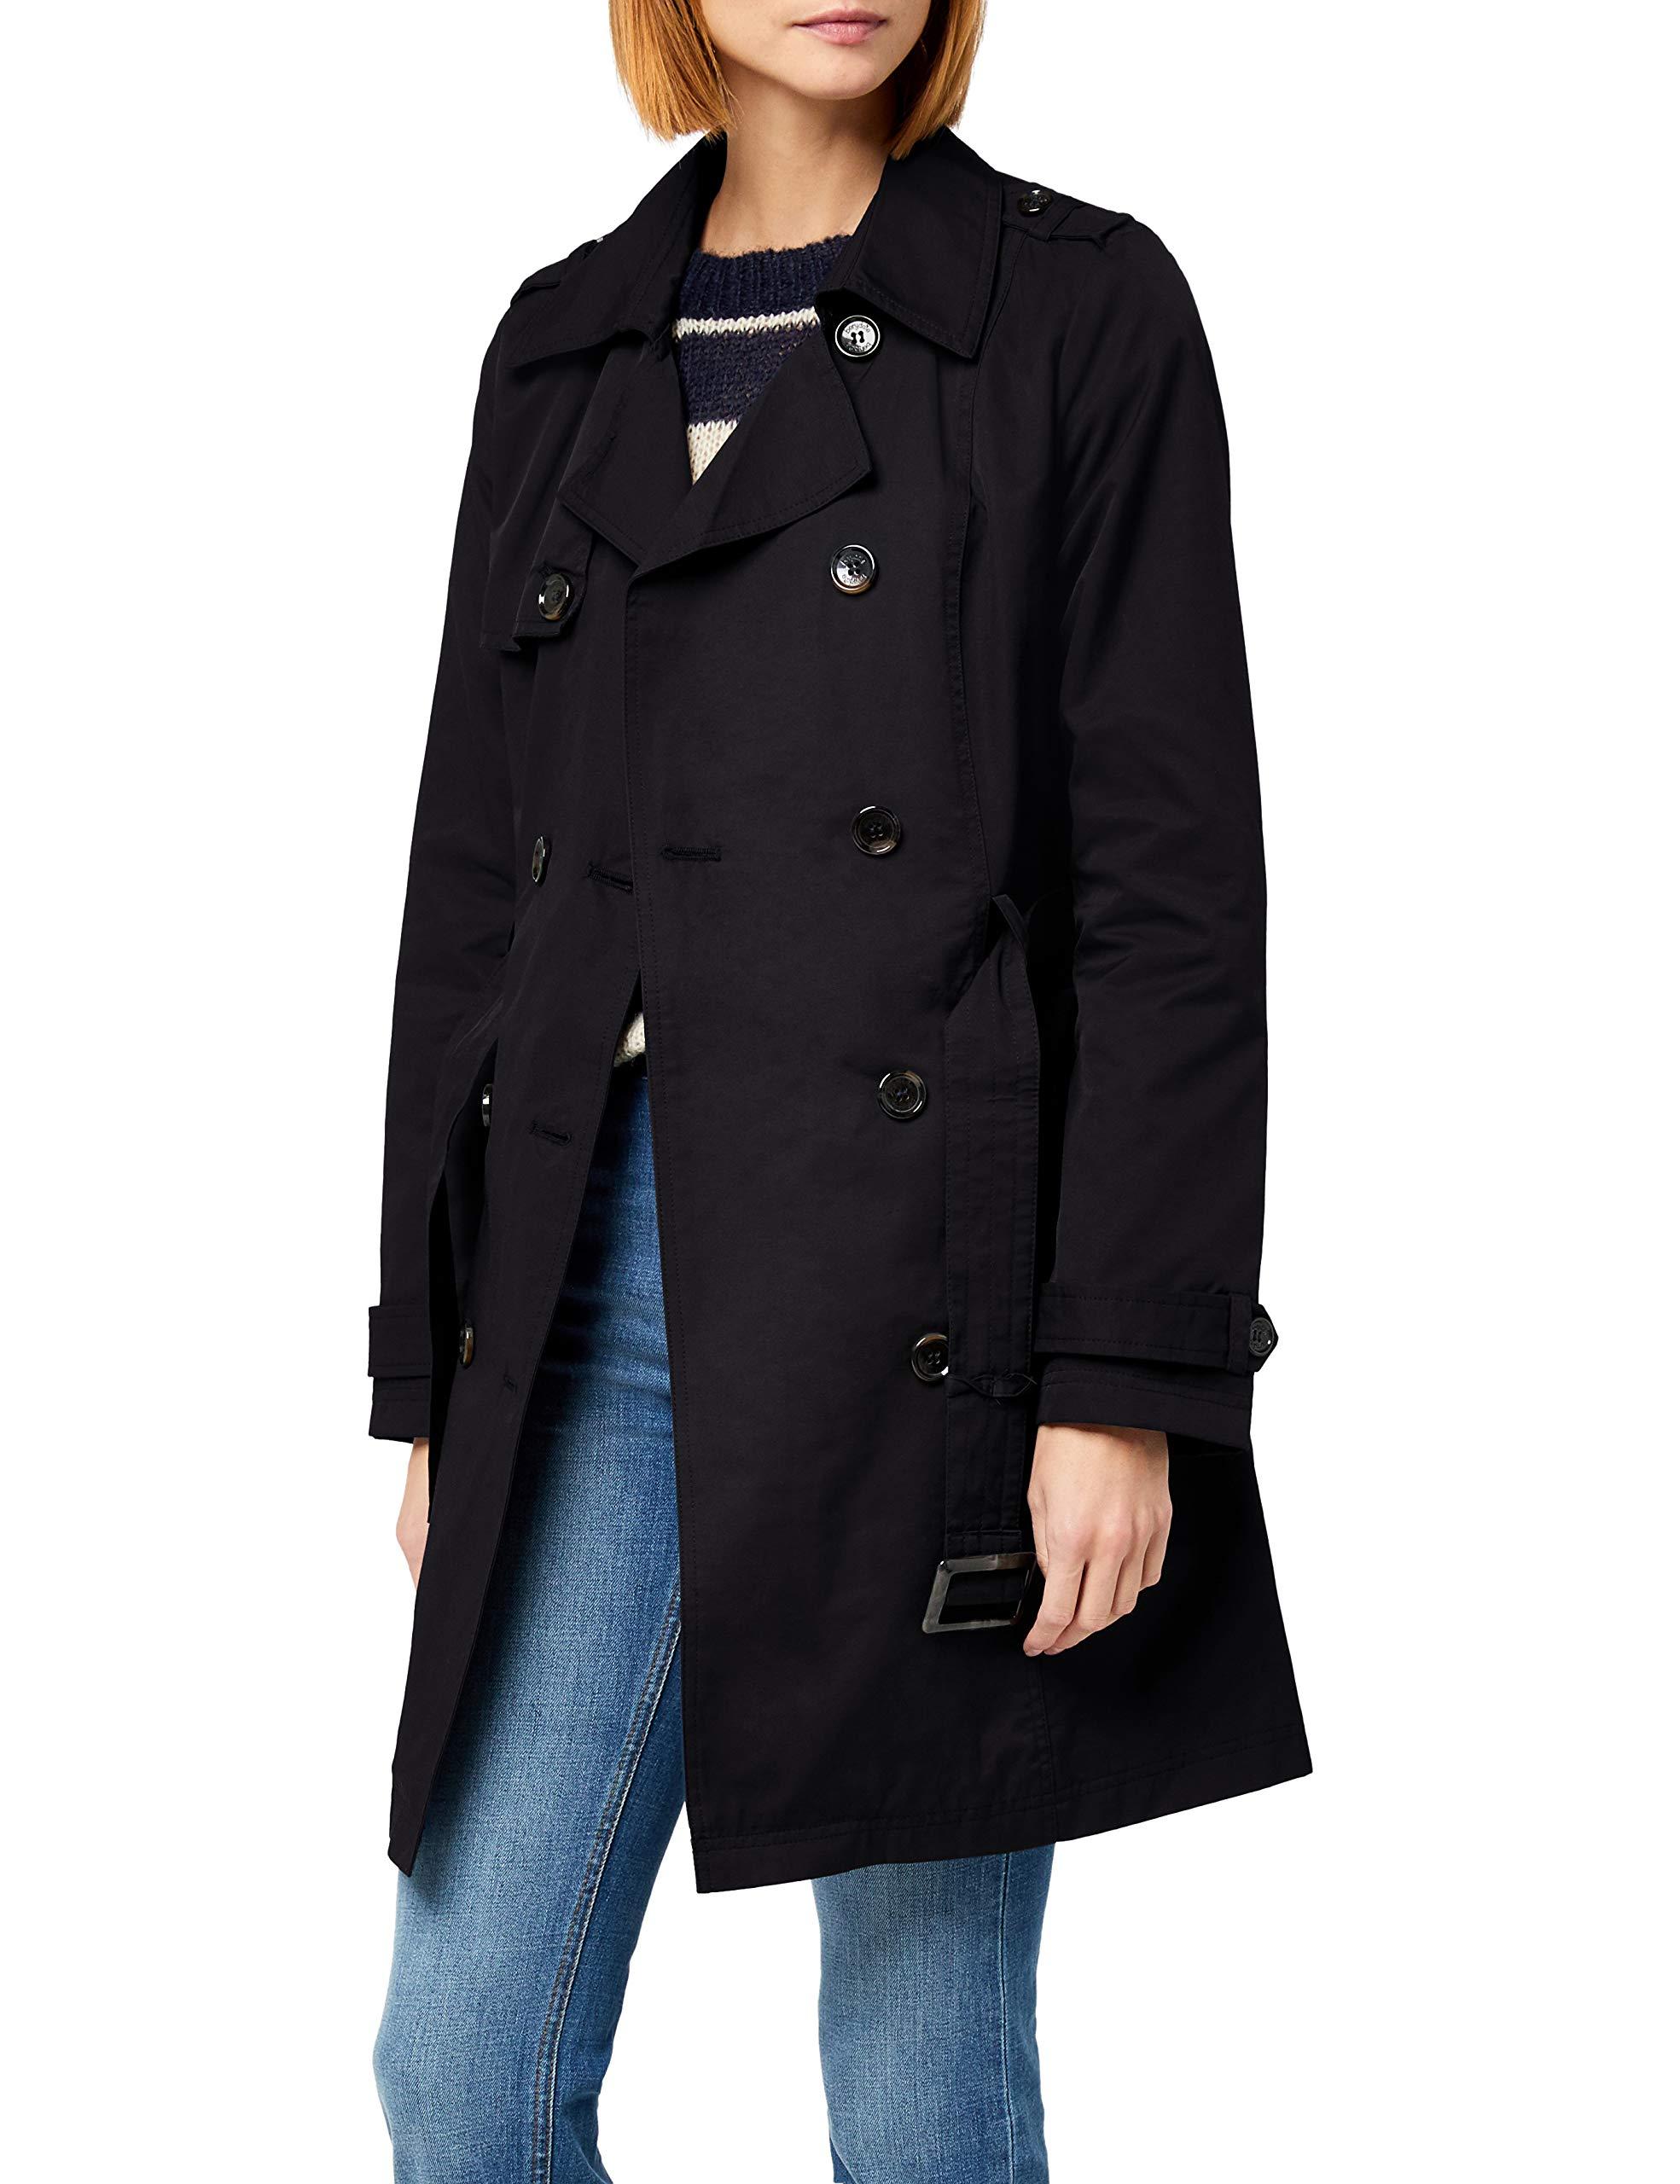 new style 30286 ca7ab Berydale Damen Trenchcoat mit Gürtel, Schwarz,38